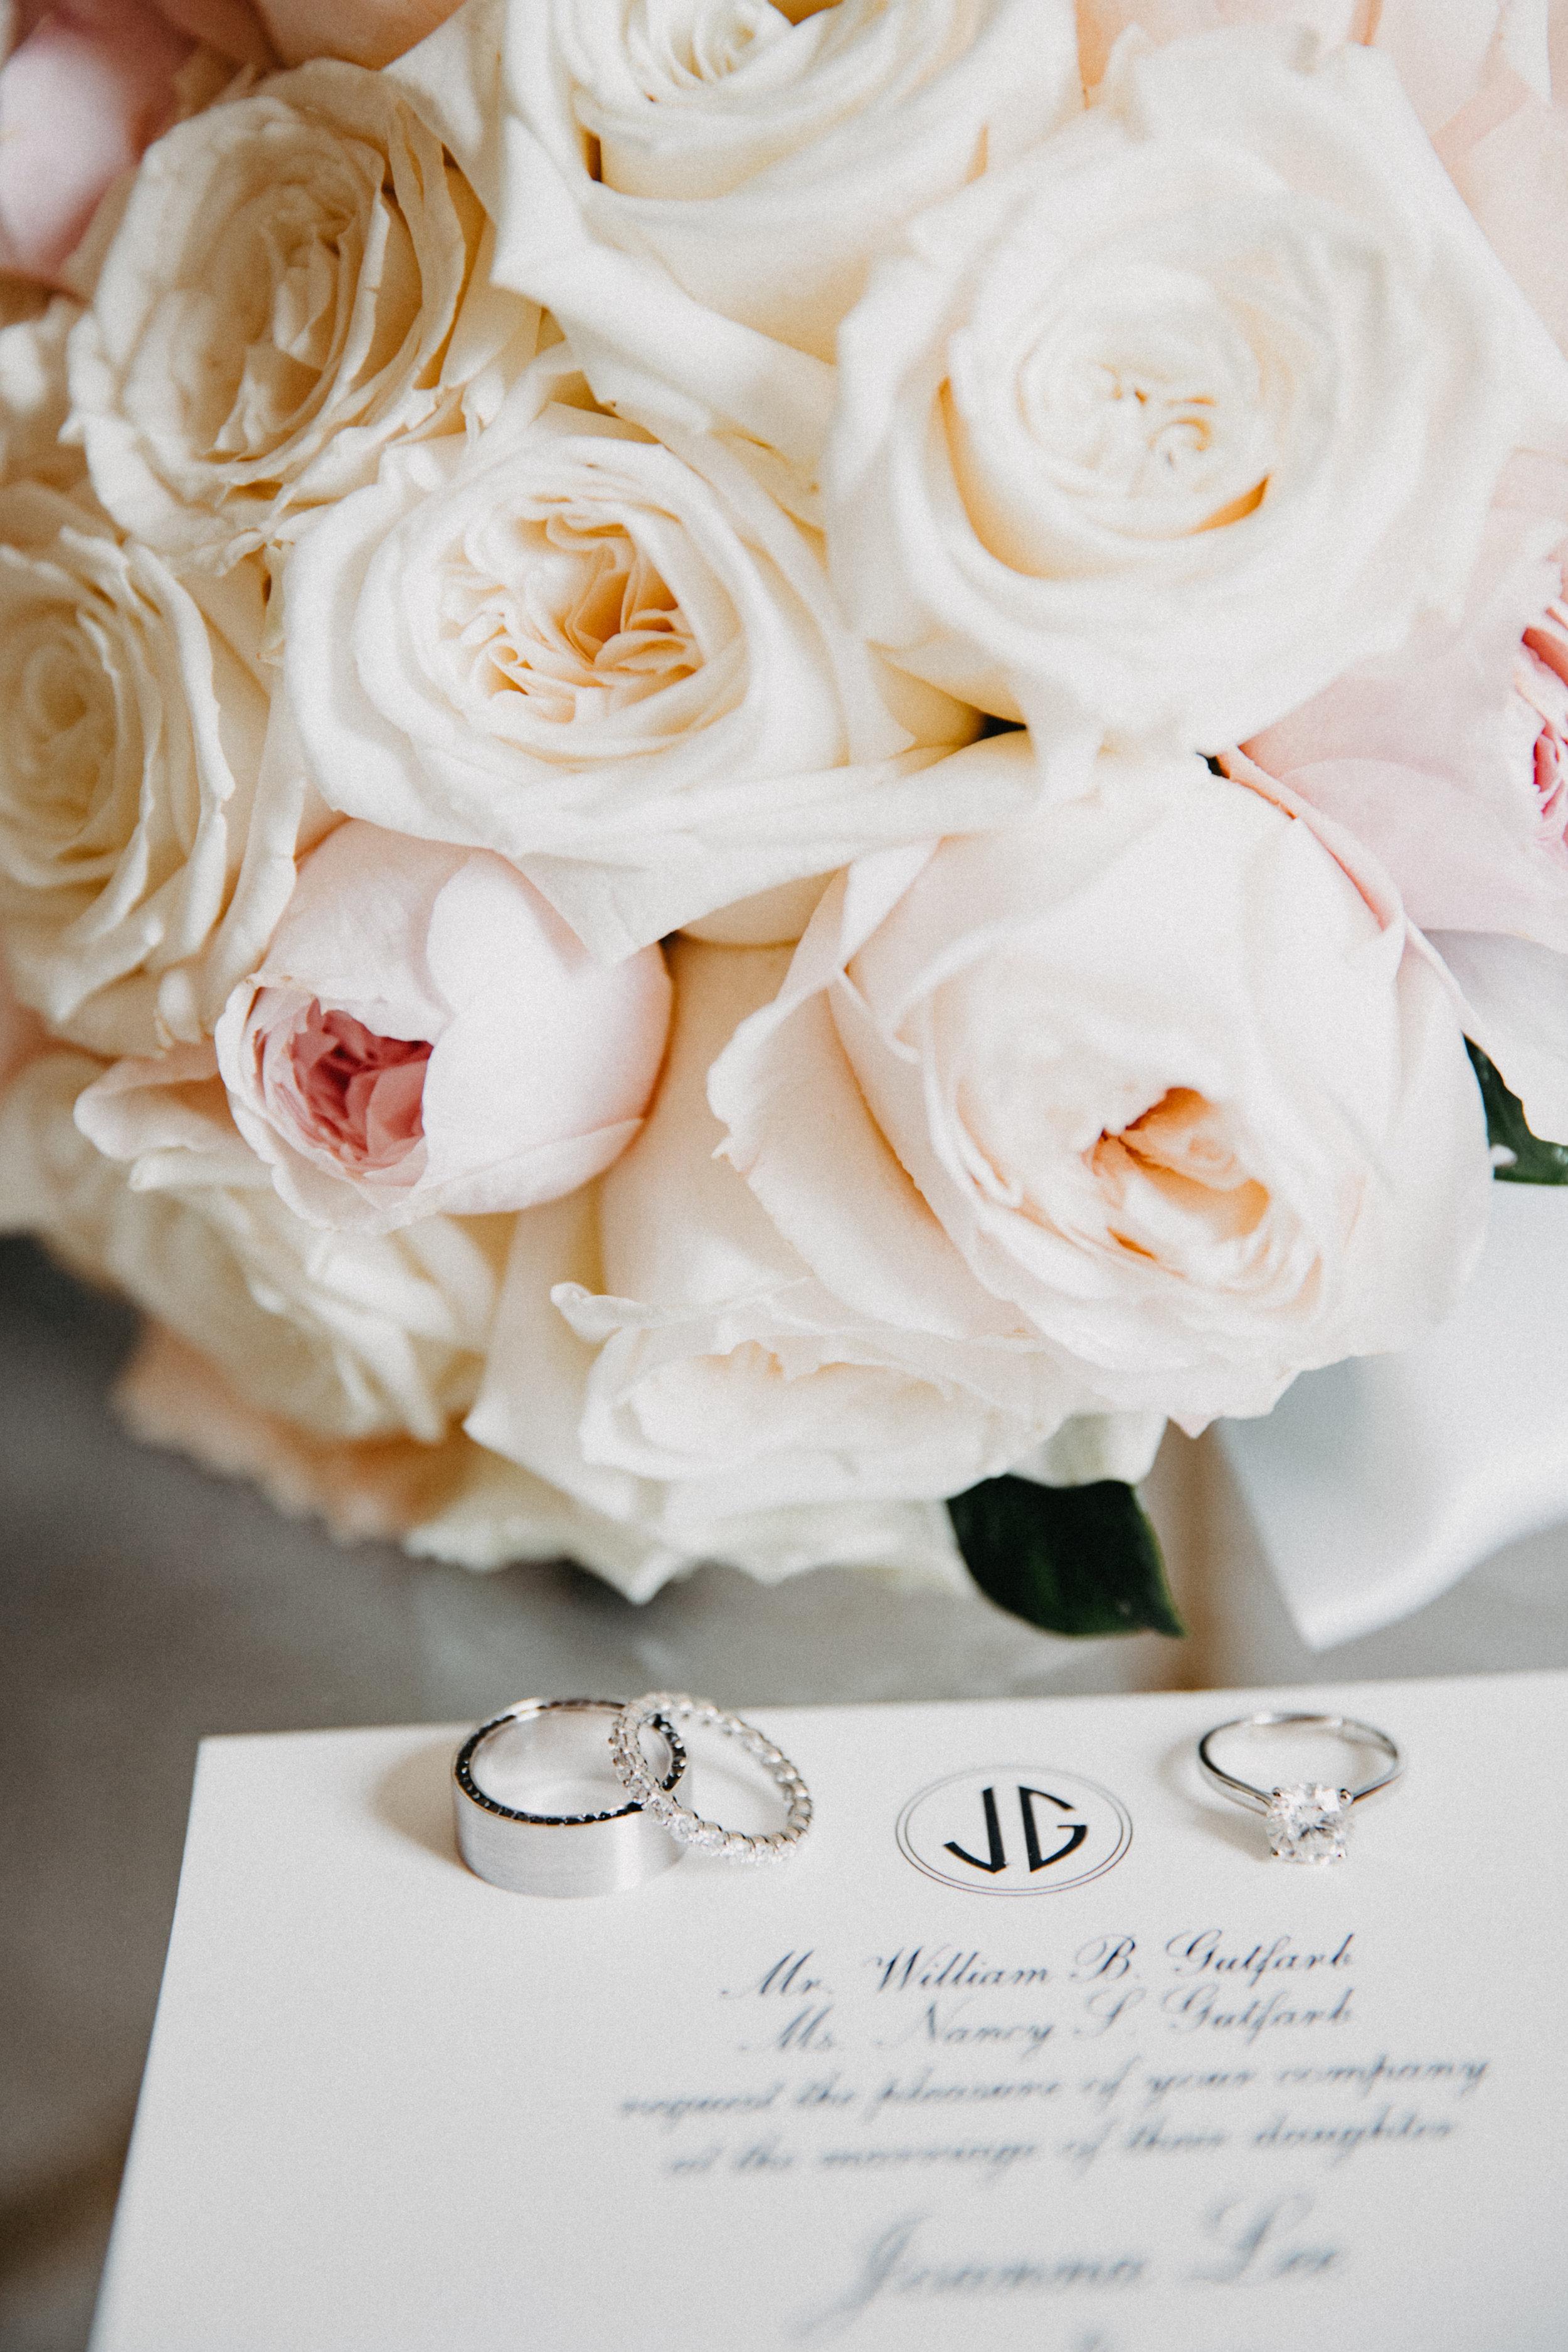 BOSTON PUBLIC GARDEN WEDDING, GARDEN WEDDING, BOSTON WEDDING PLANNER, NICOLE SIMERAL, FOUR SEASONS WEDDING, CLASSIC, TIMELESS, WEDDING WEDDING PLANNER, DESTINATION WEDDING, WEDDING BOUQUET